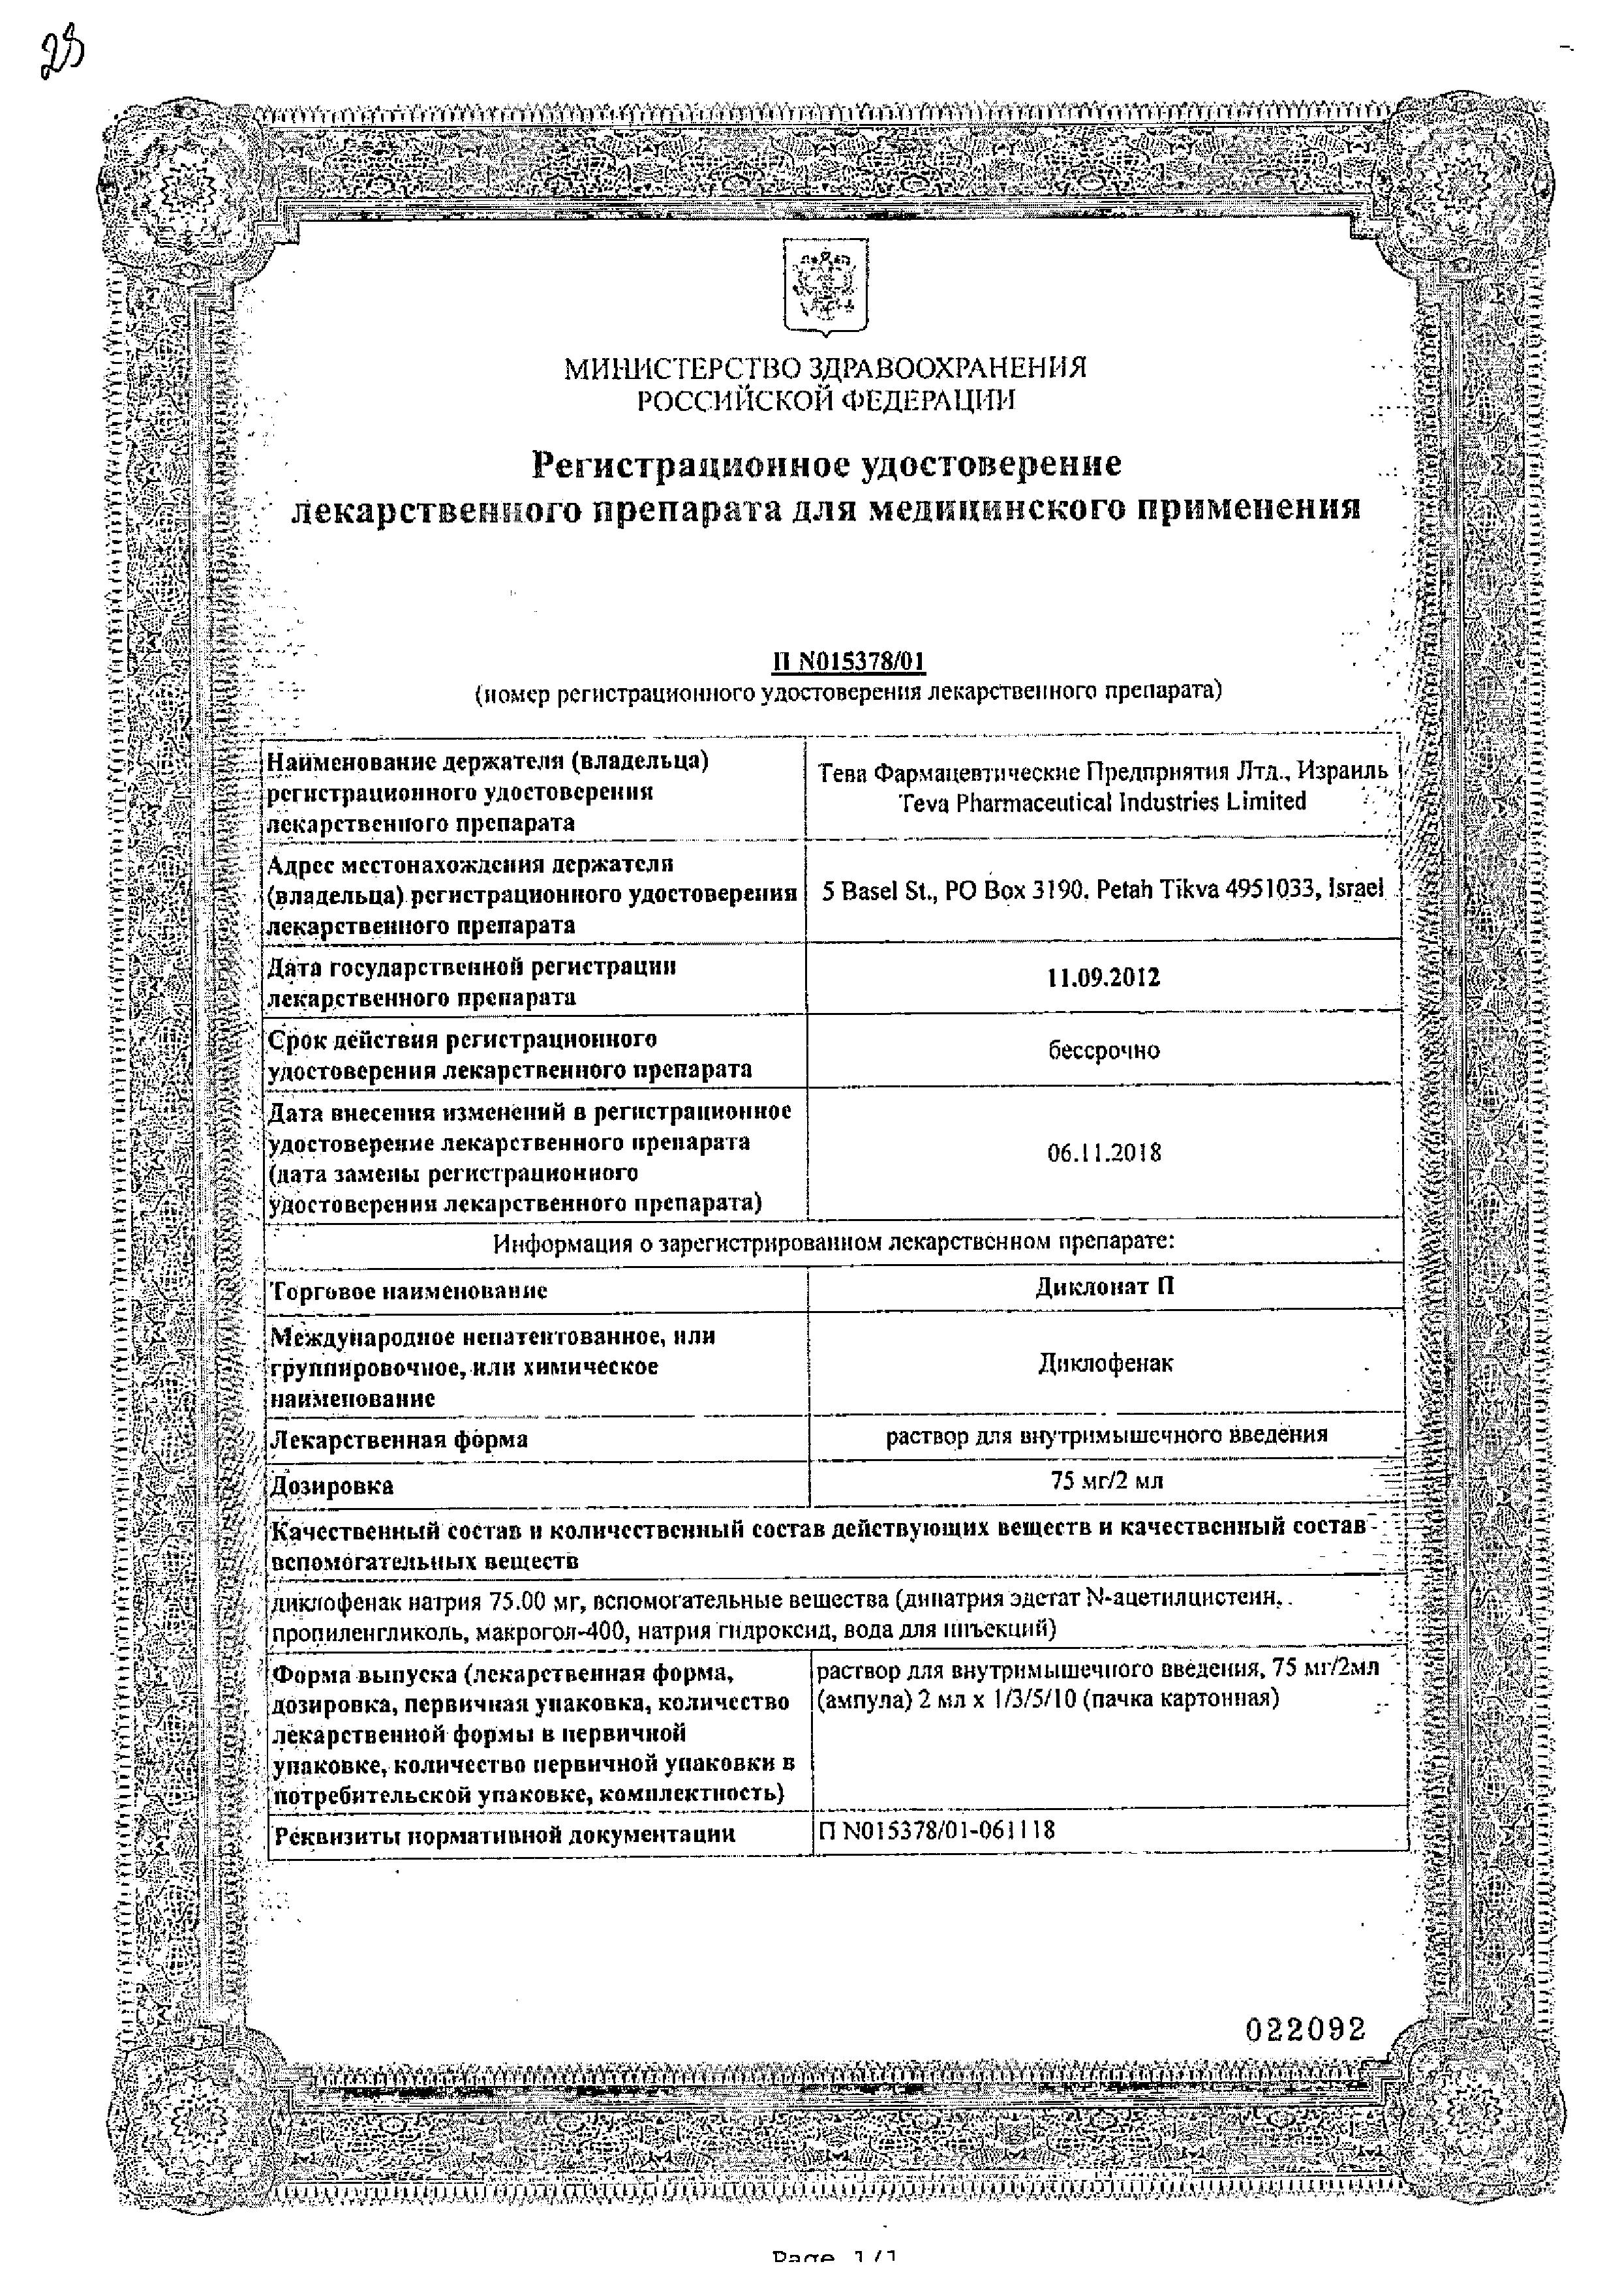 Диклонат П сертификат